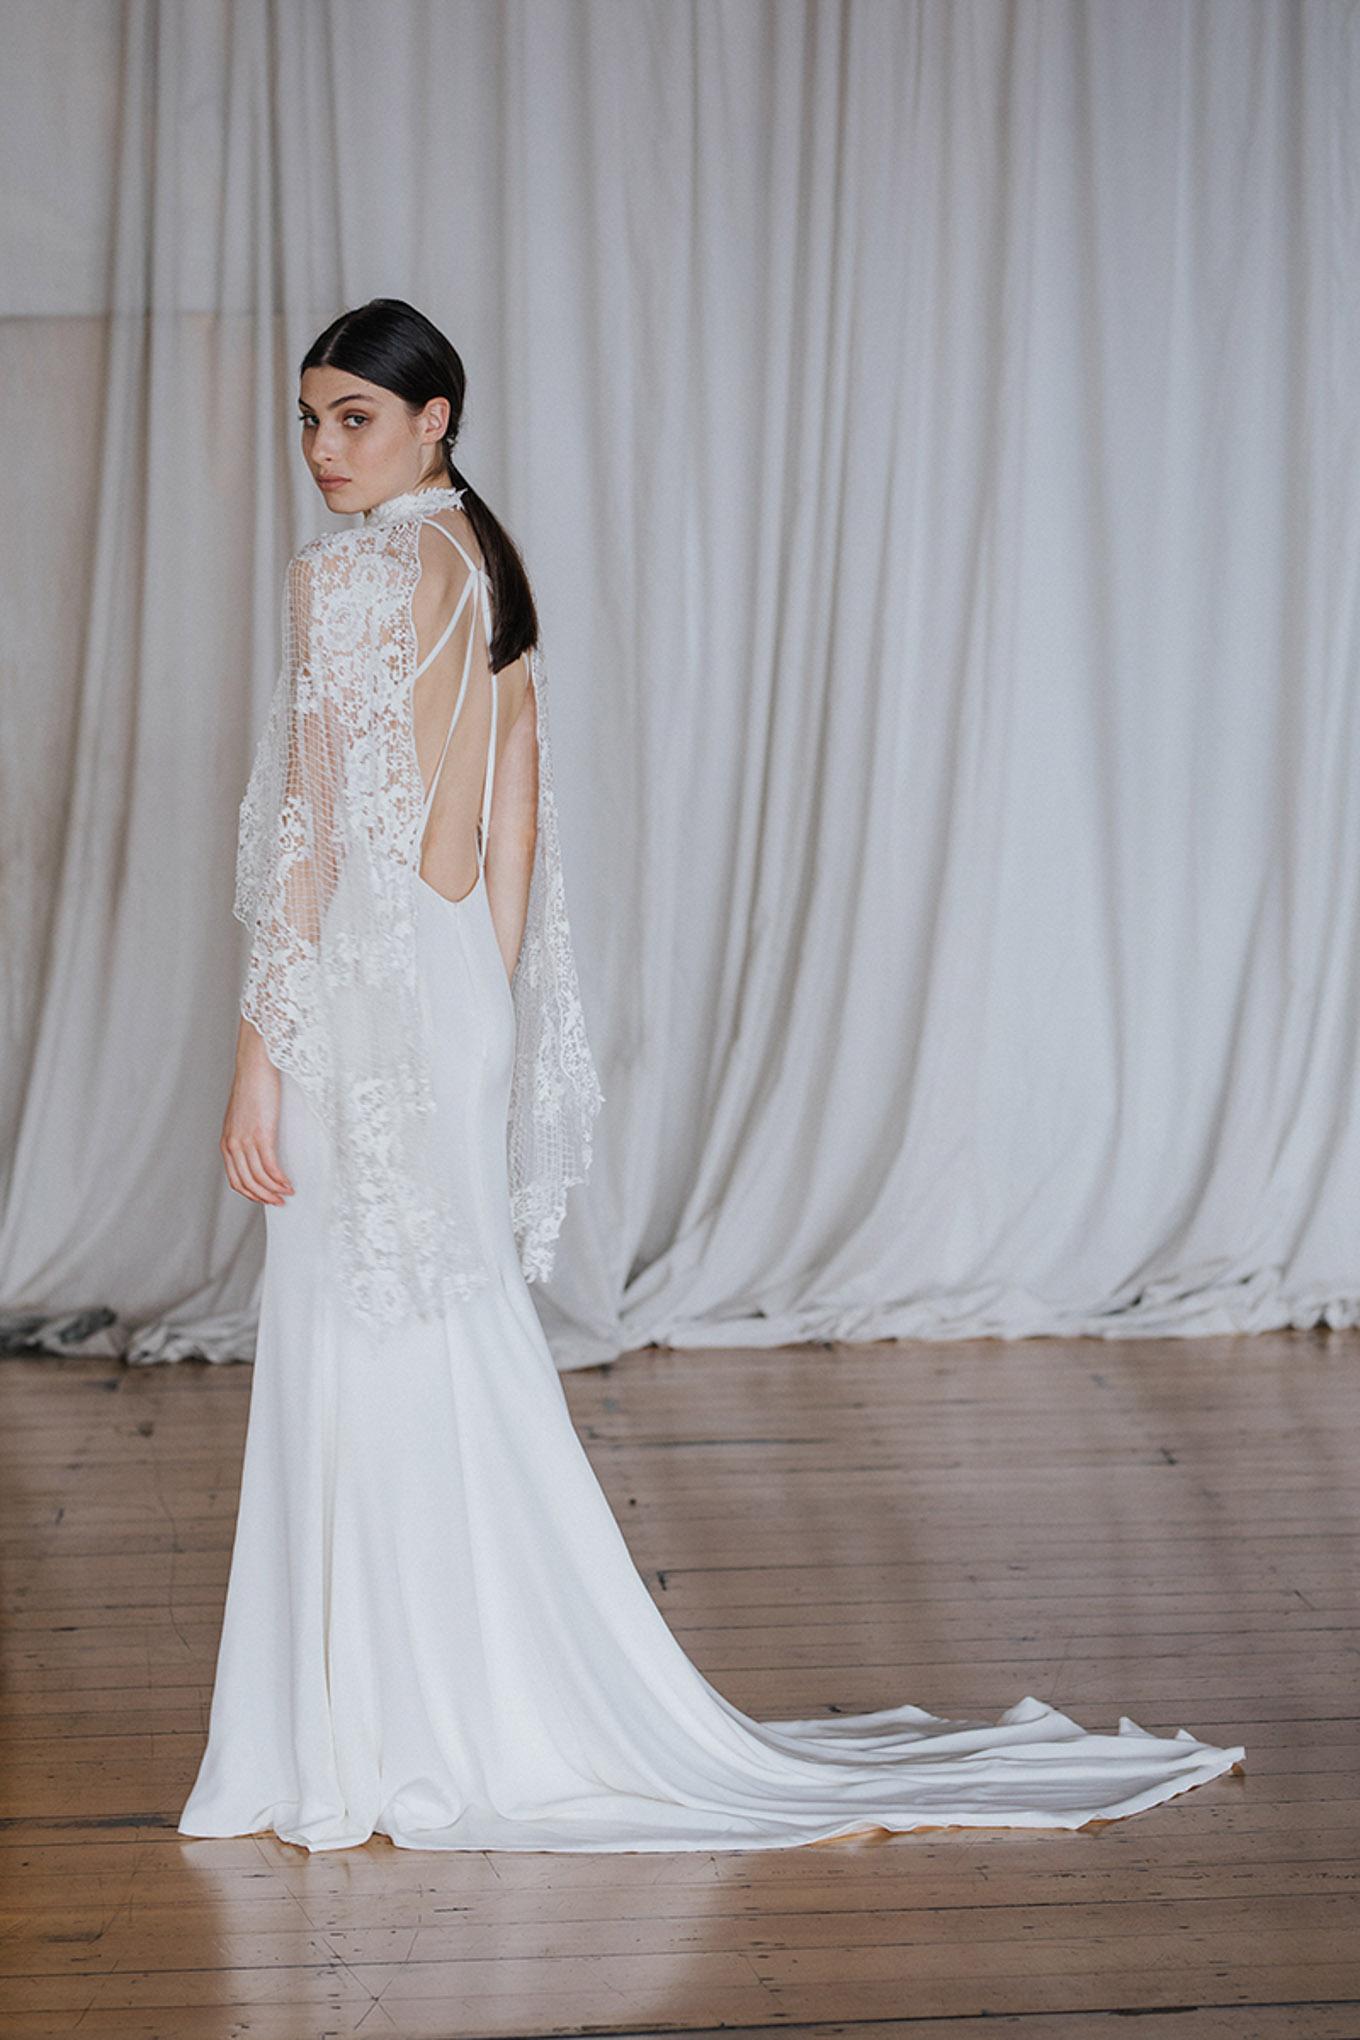 dce85807e95 Us Wedding Gown Designers - Gomes Weine AG